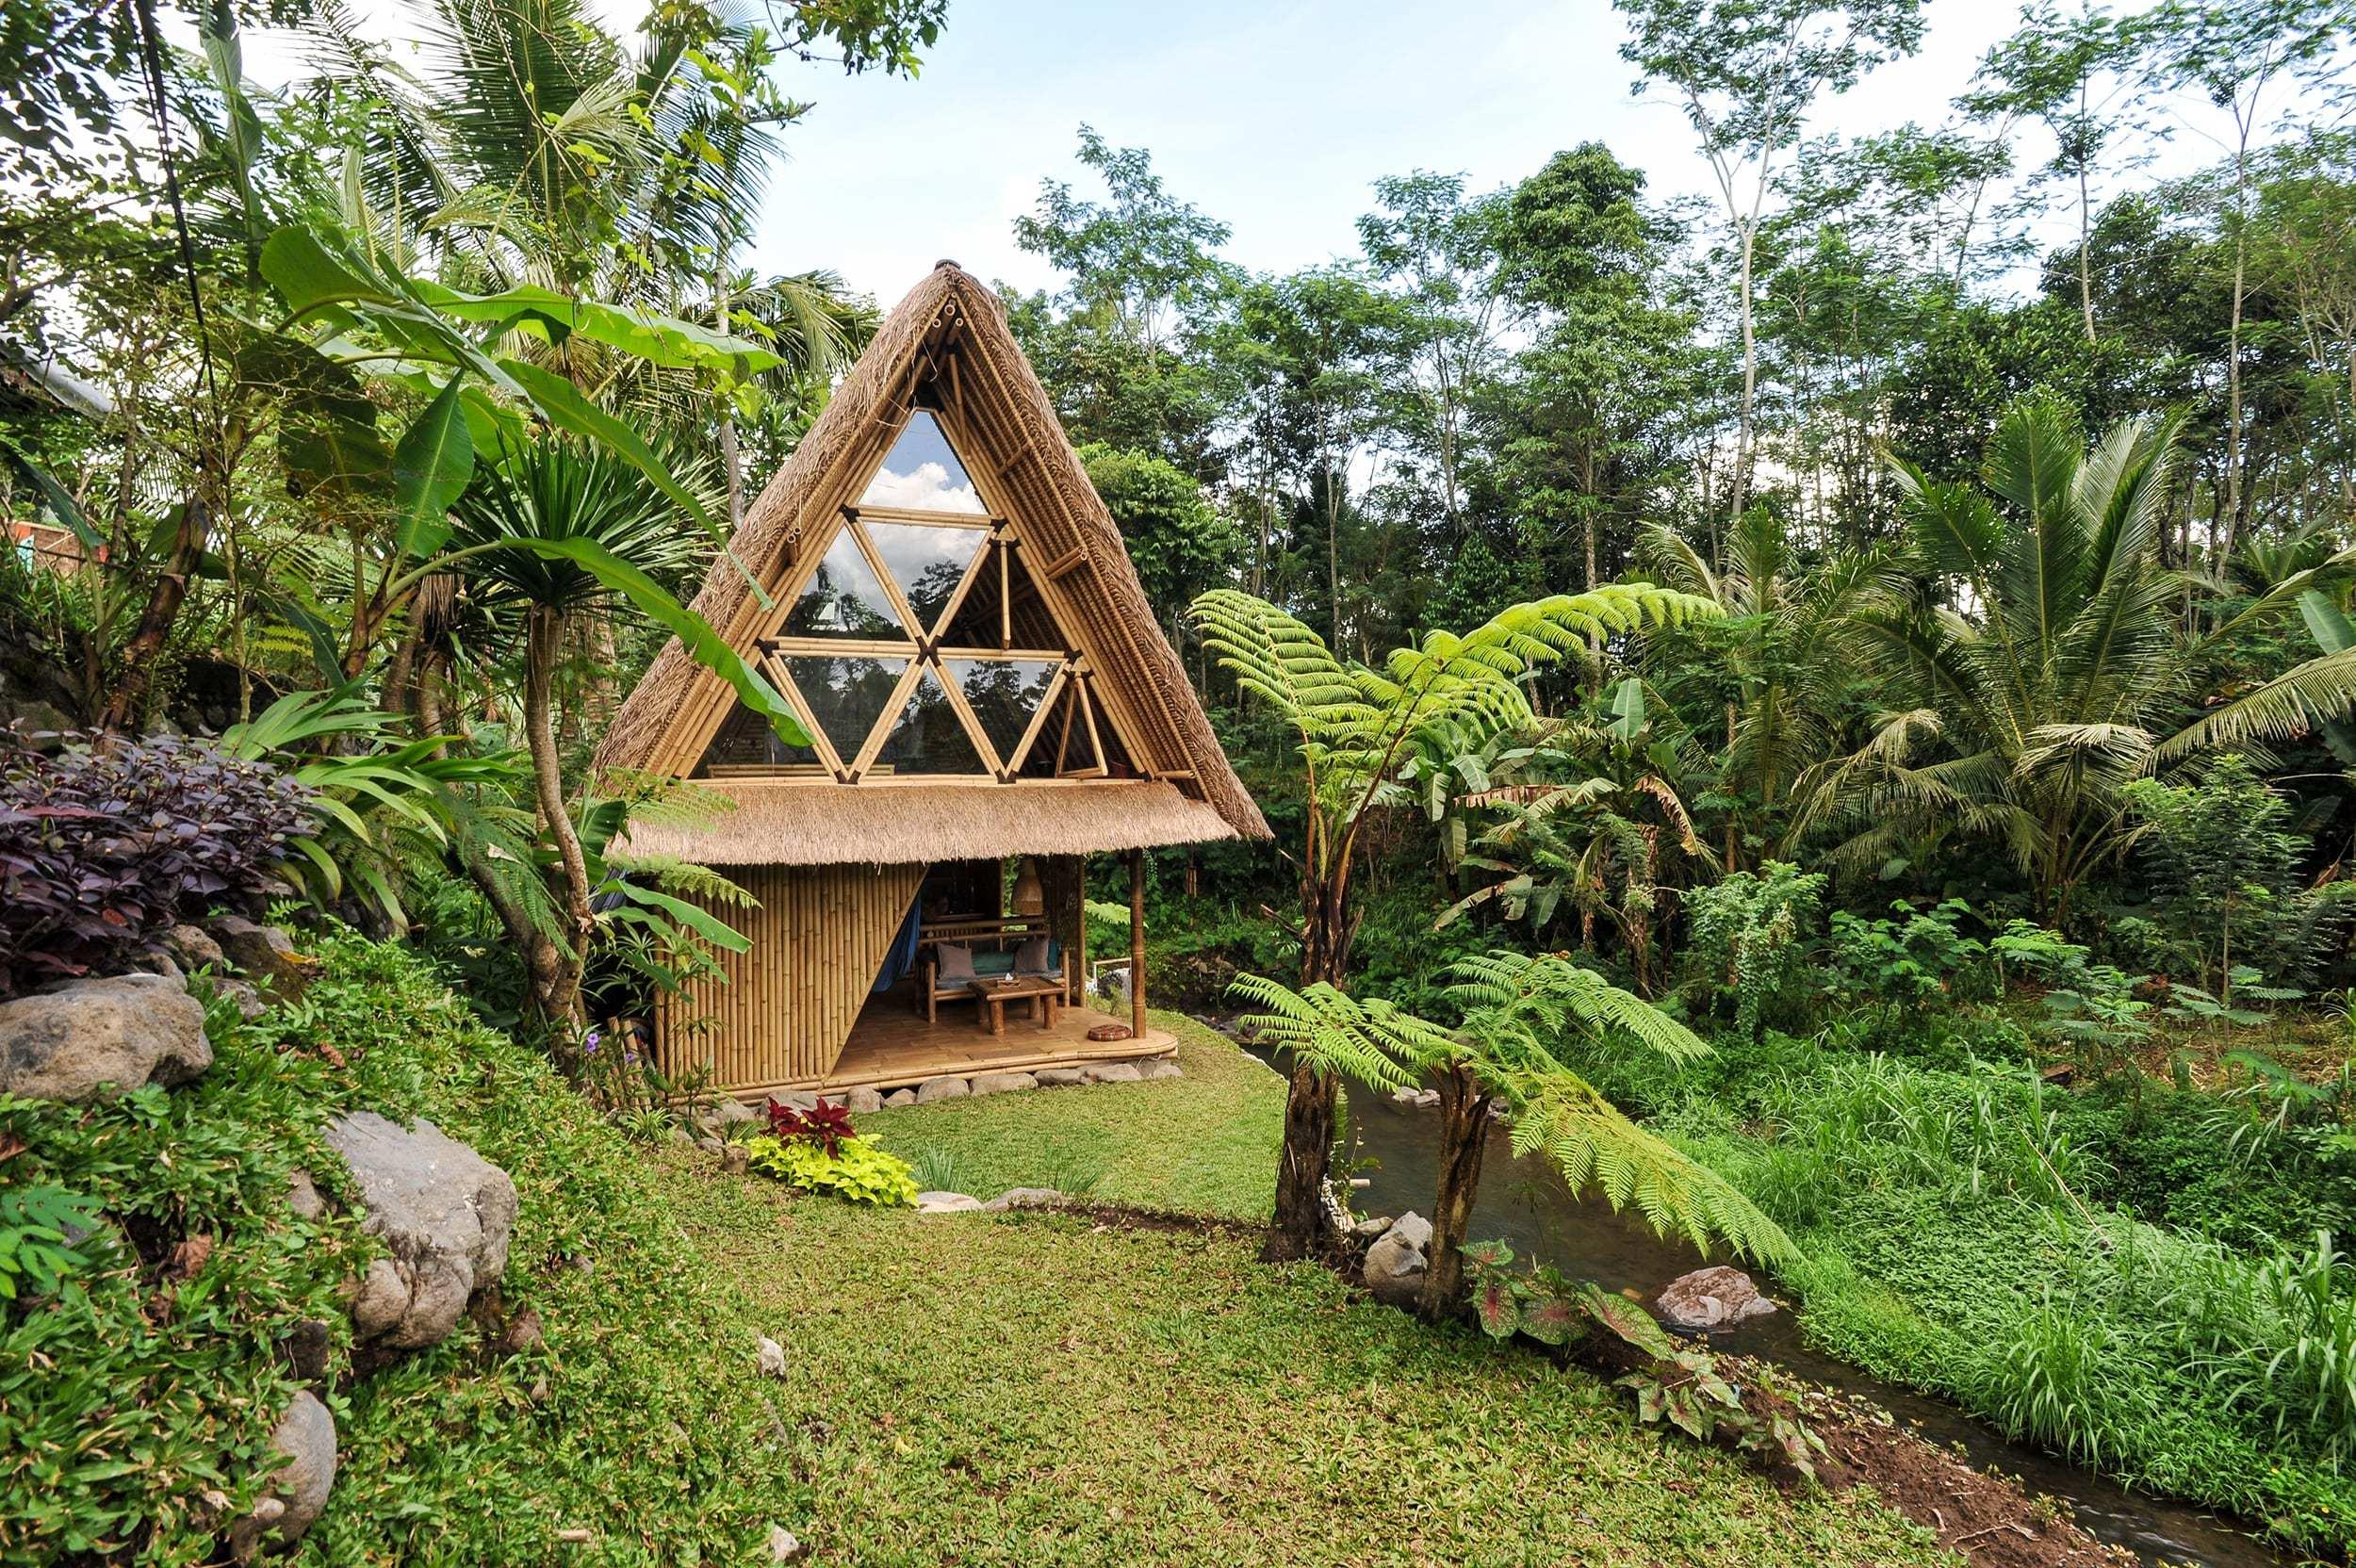 4-hideout-bali-eco-bamboo-home-min.jpg